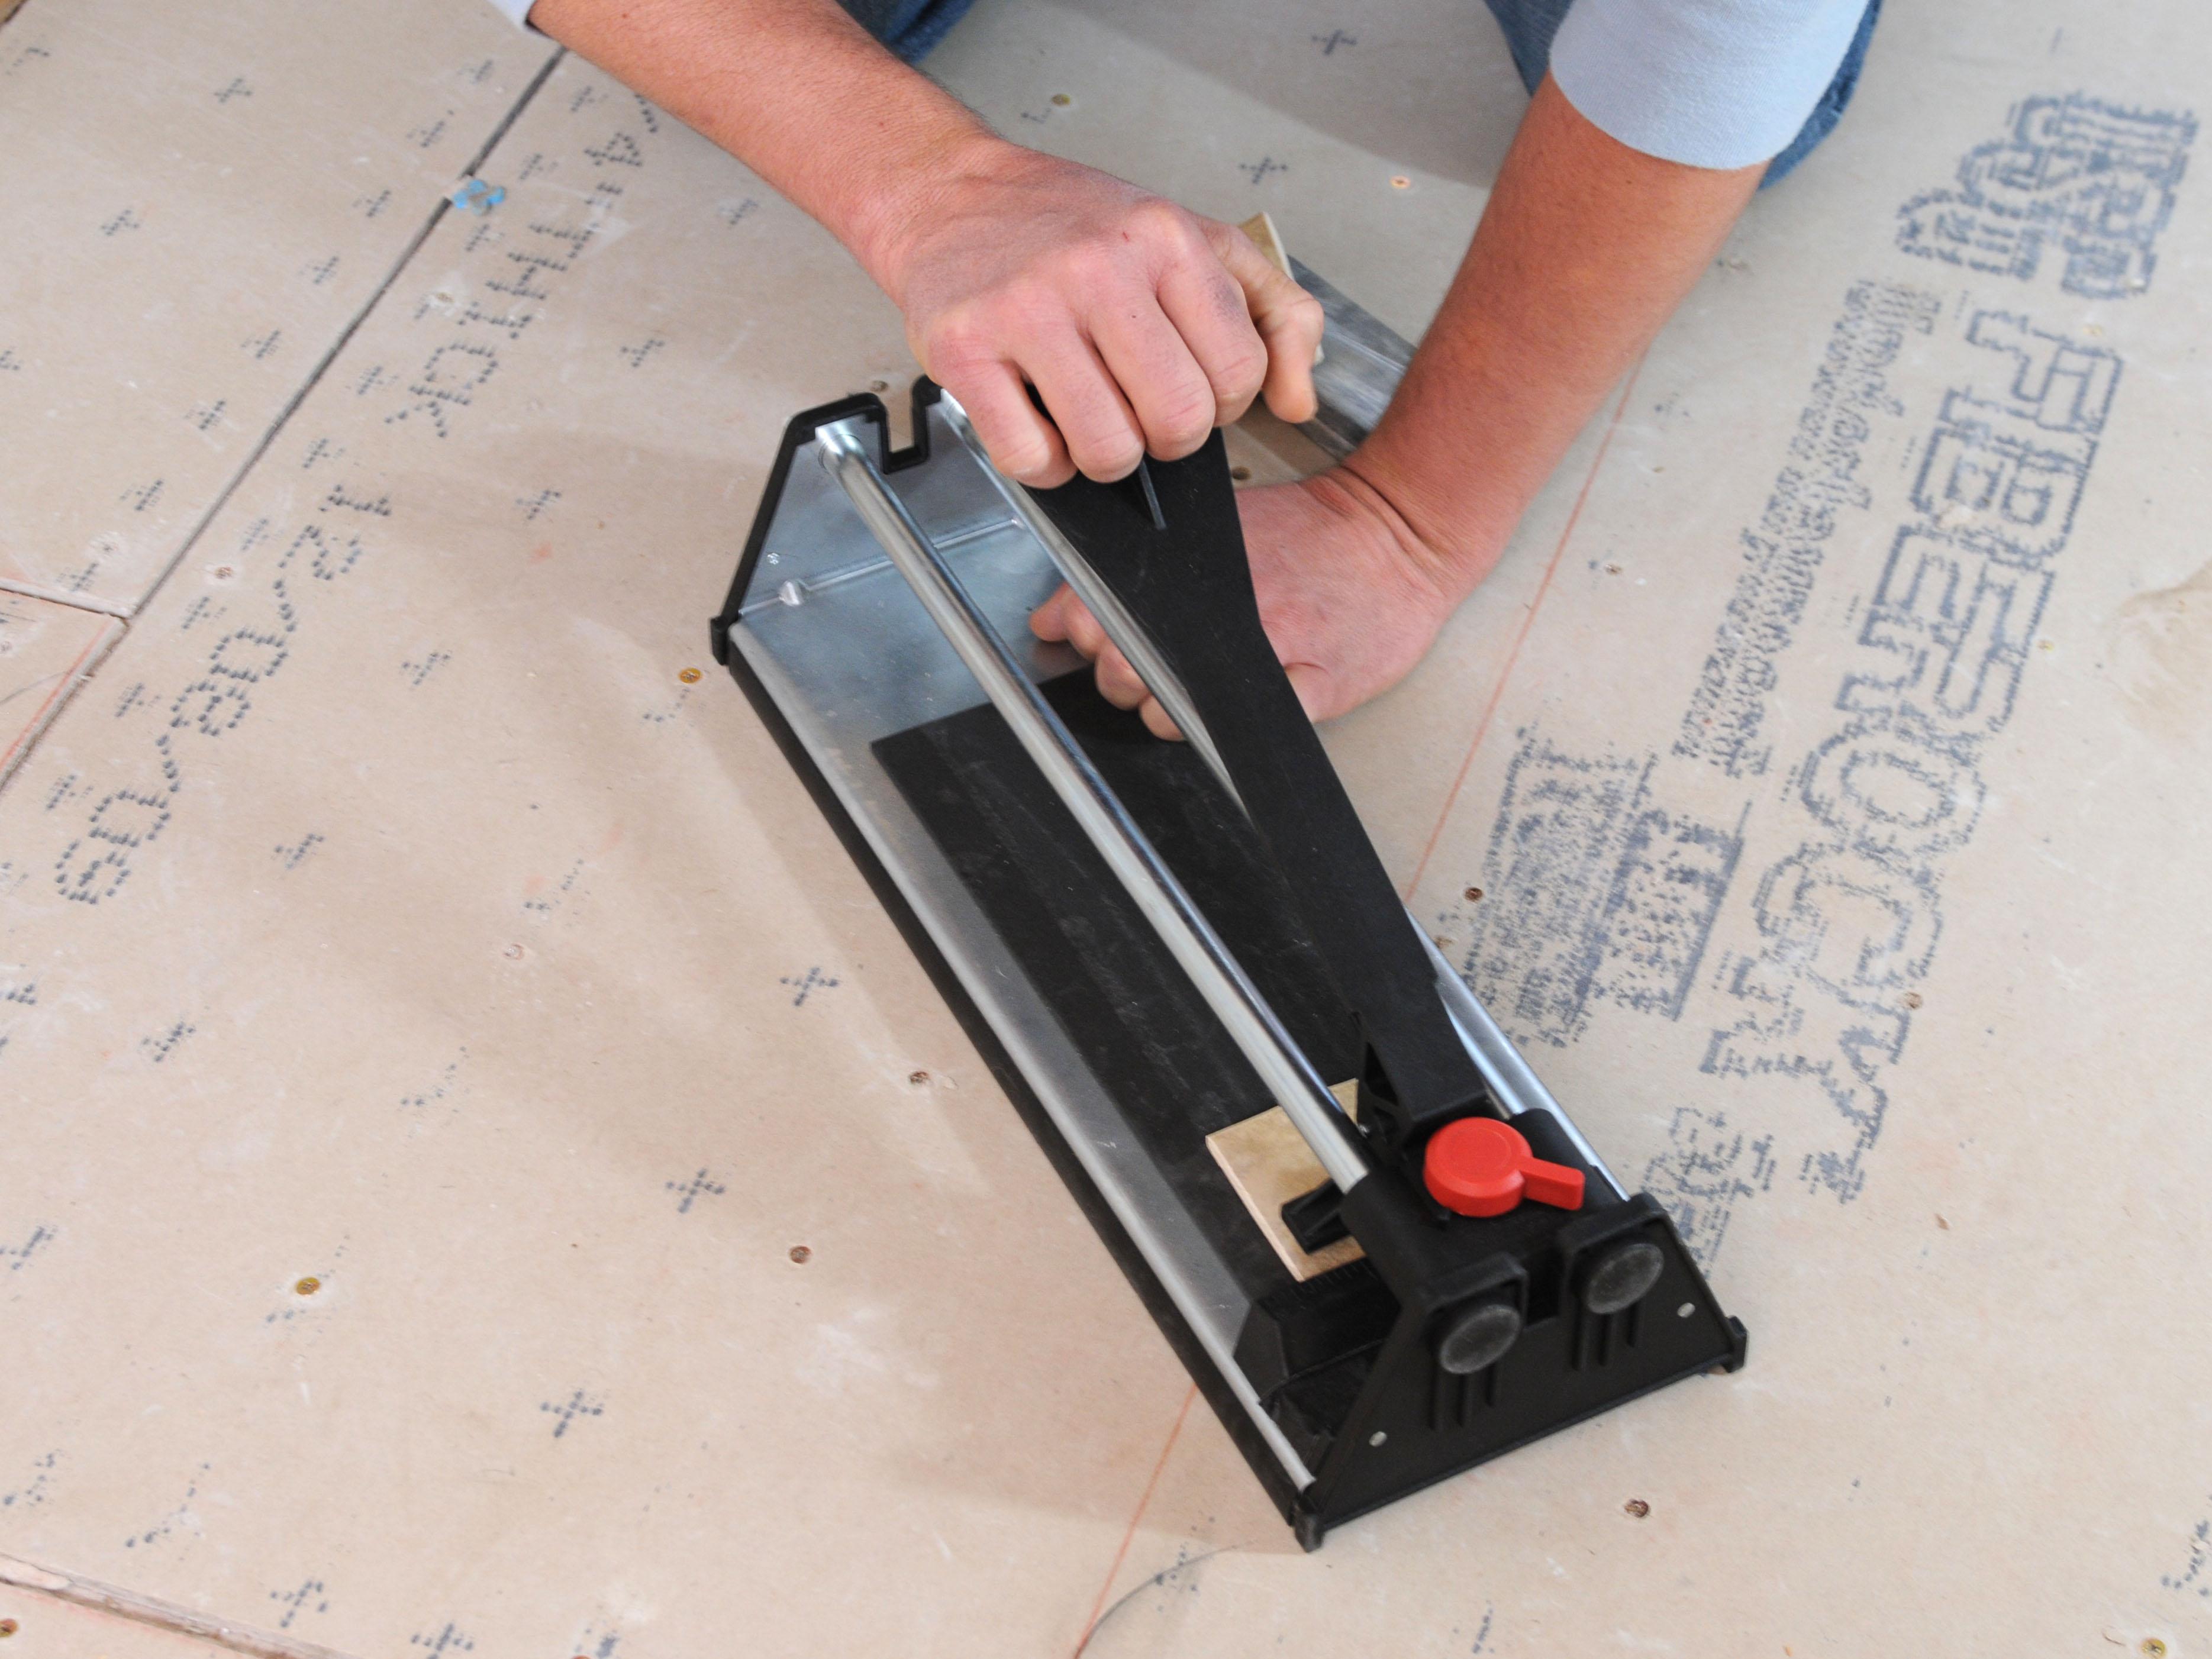 Fine 12 Ceramic Tile Huge 1X2 Subway Tile Round 2 X 8 Subway Tile 2X2 Ceiling Tile Old 2X4 Subway Tile Bright3 Tile Patterns For Floors Laying A New Tile Floor | How Tos | DIY